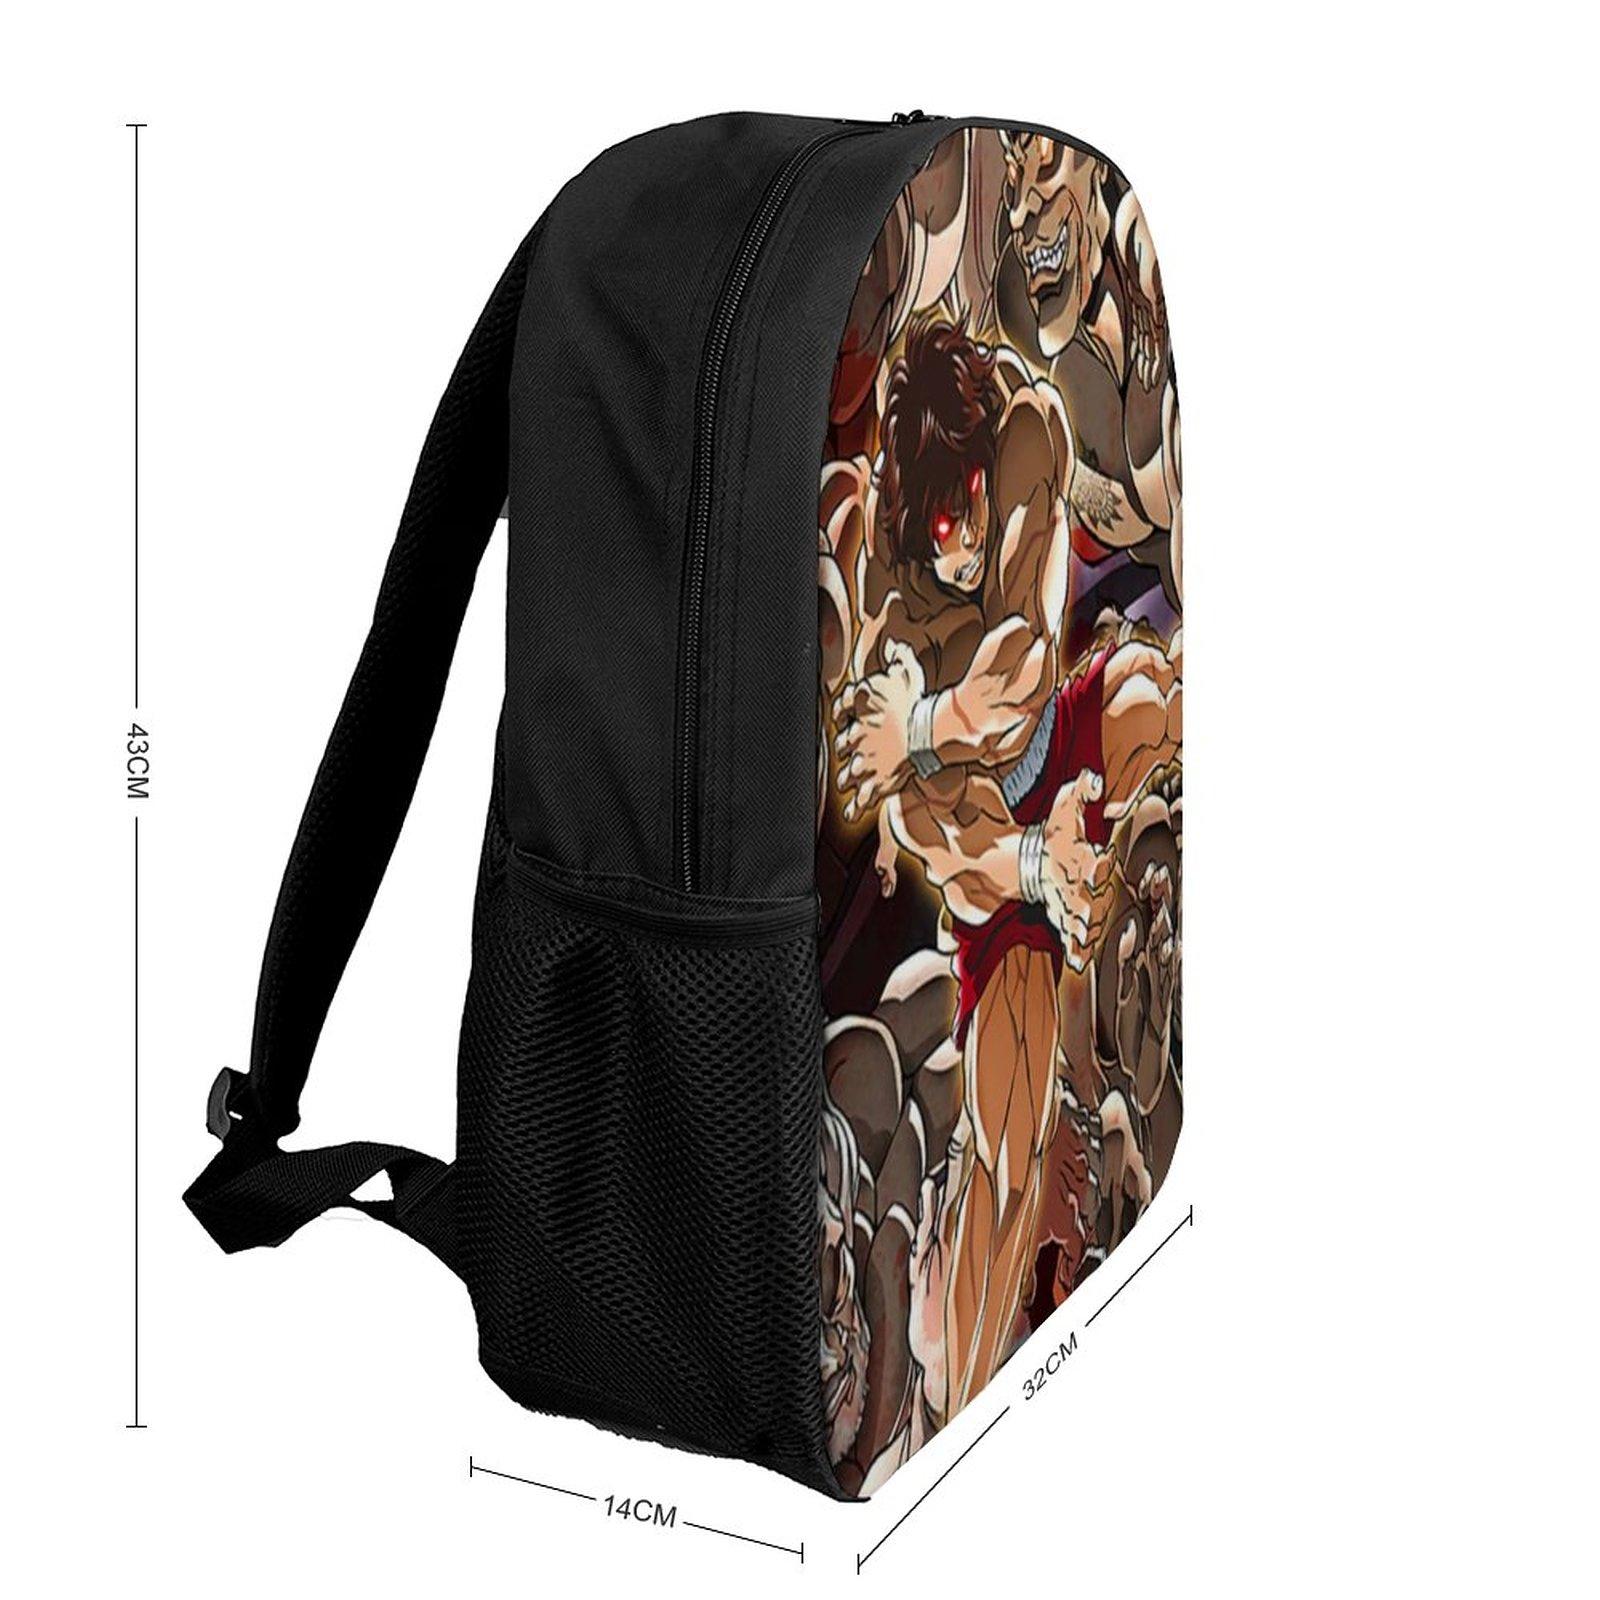 H9f5ef6c93d0f496aa557d6dc6e3a97f9I - Anime Backpacks